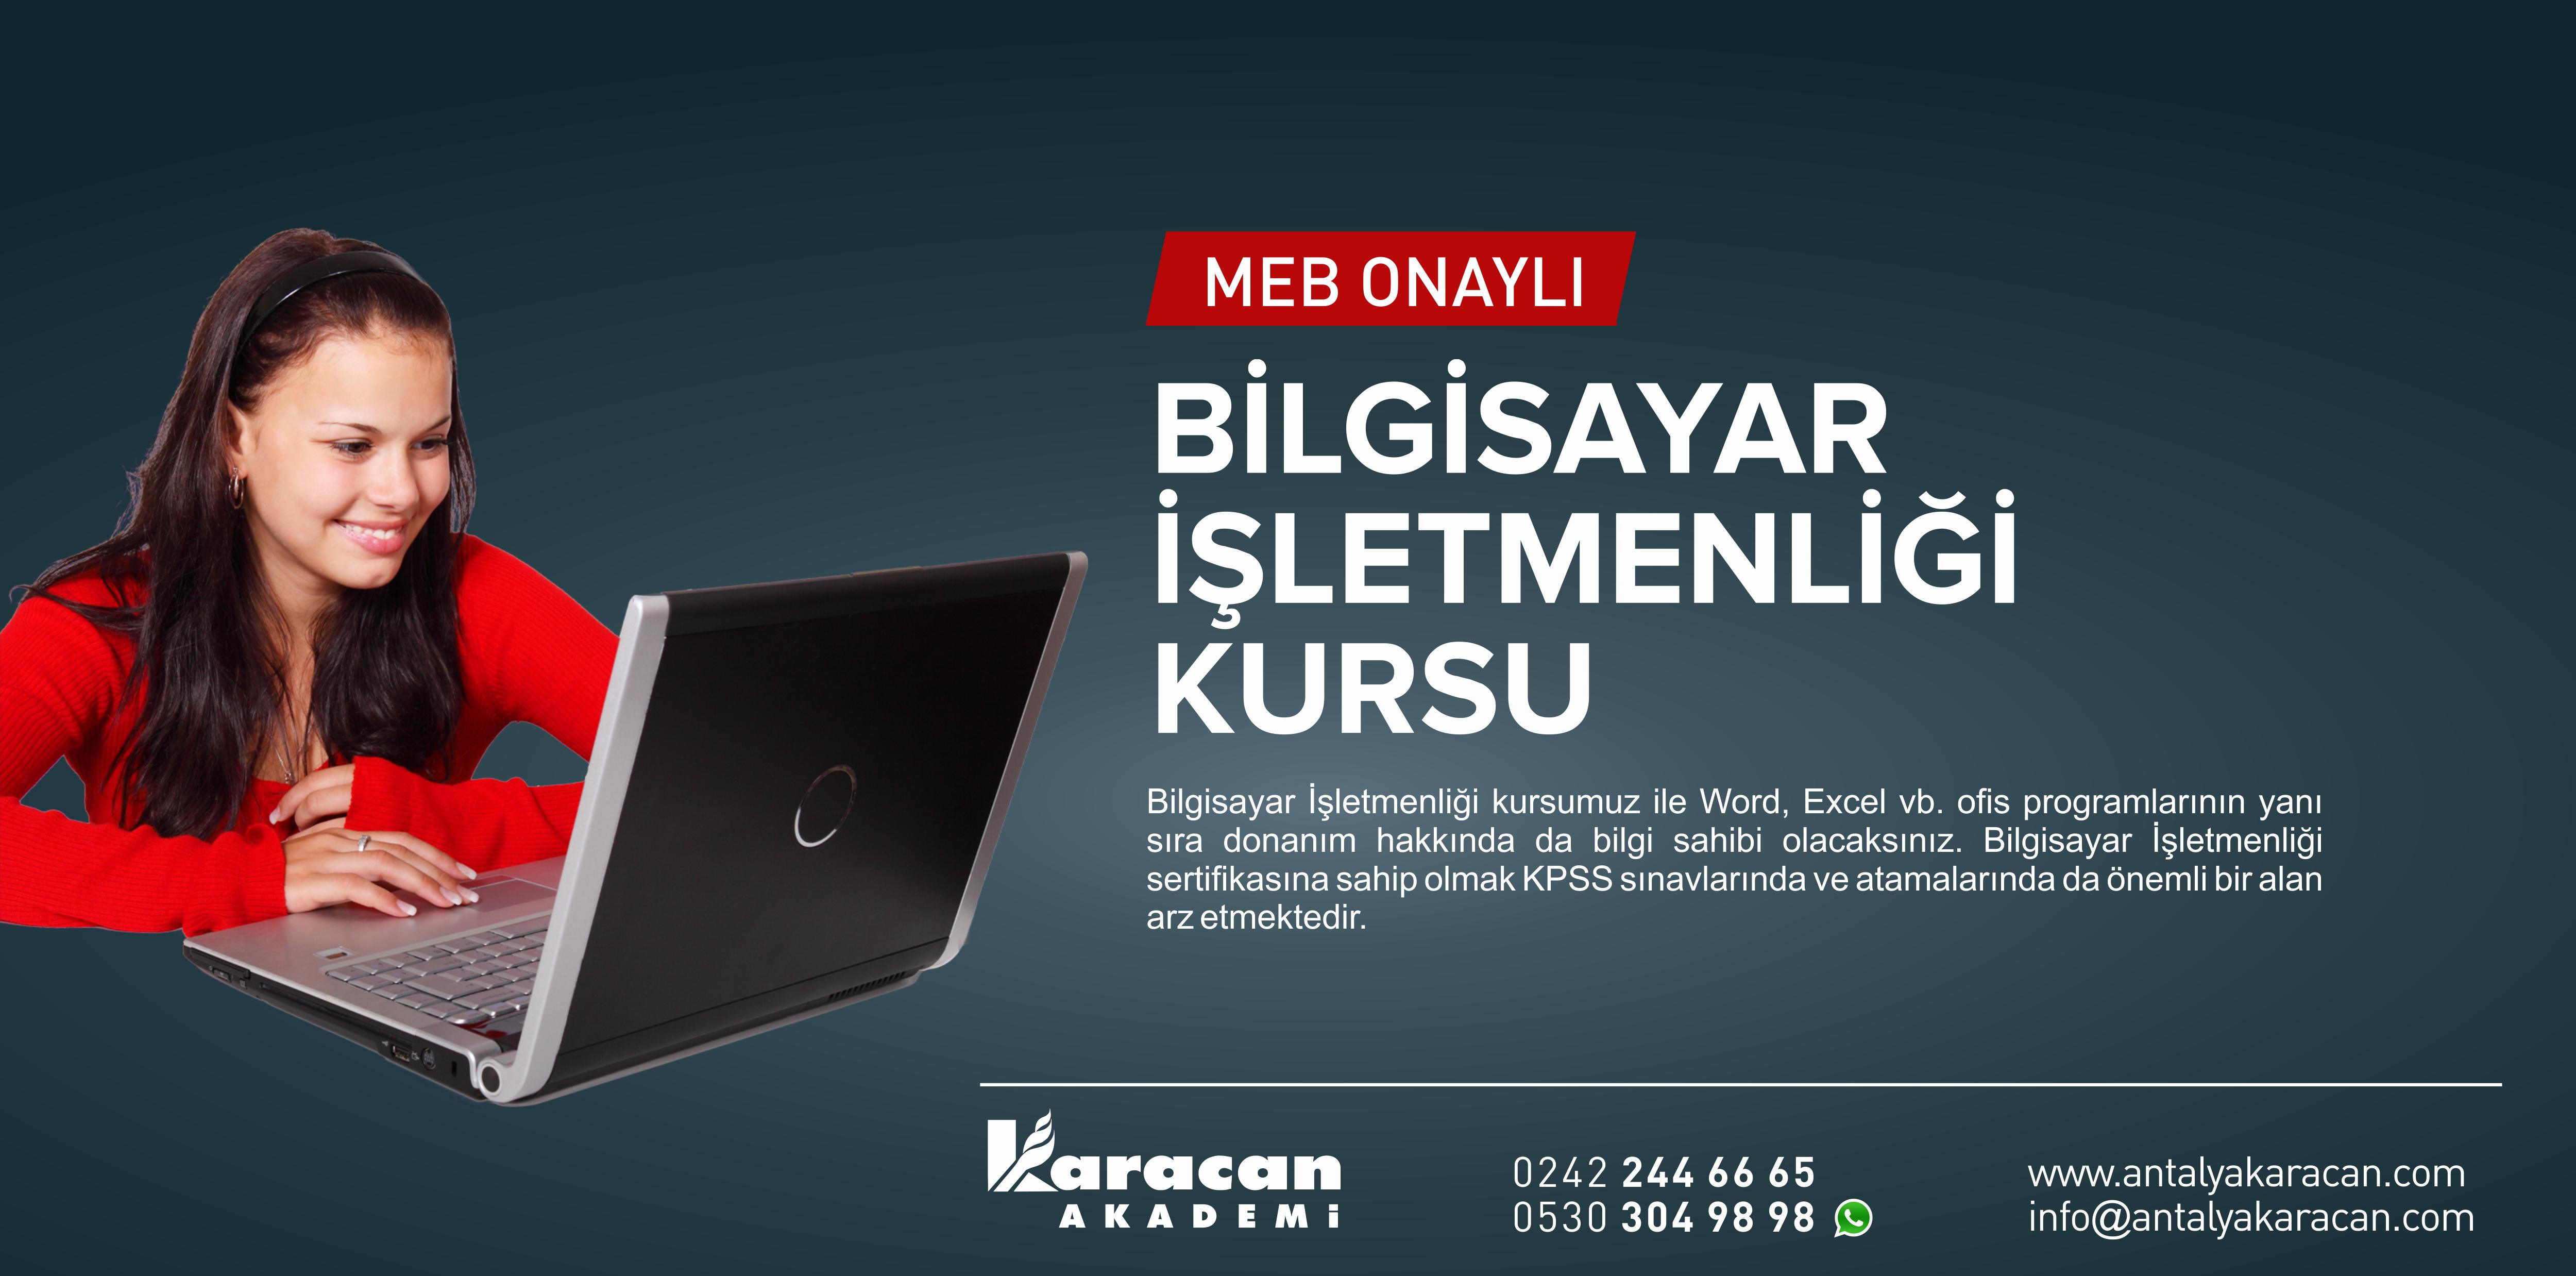 Antalya M.E.B. Onaylı Bilgisayar İşletmenligi Kursu